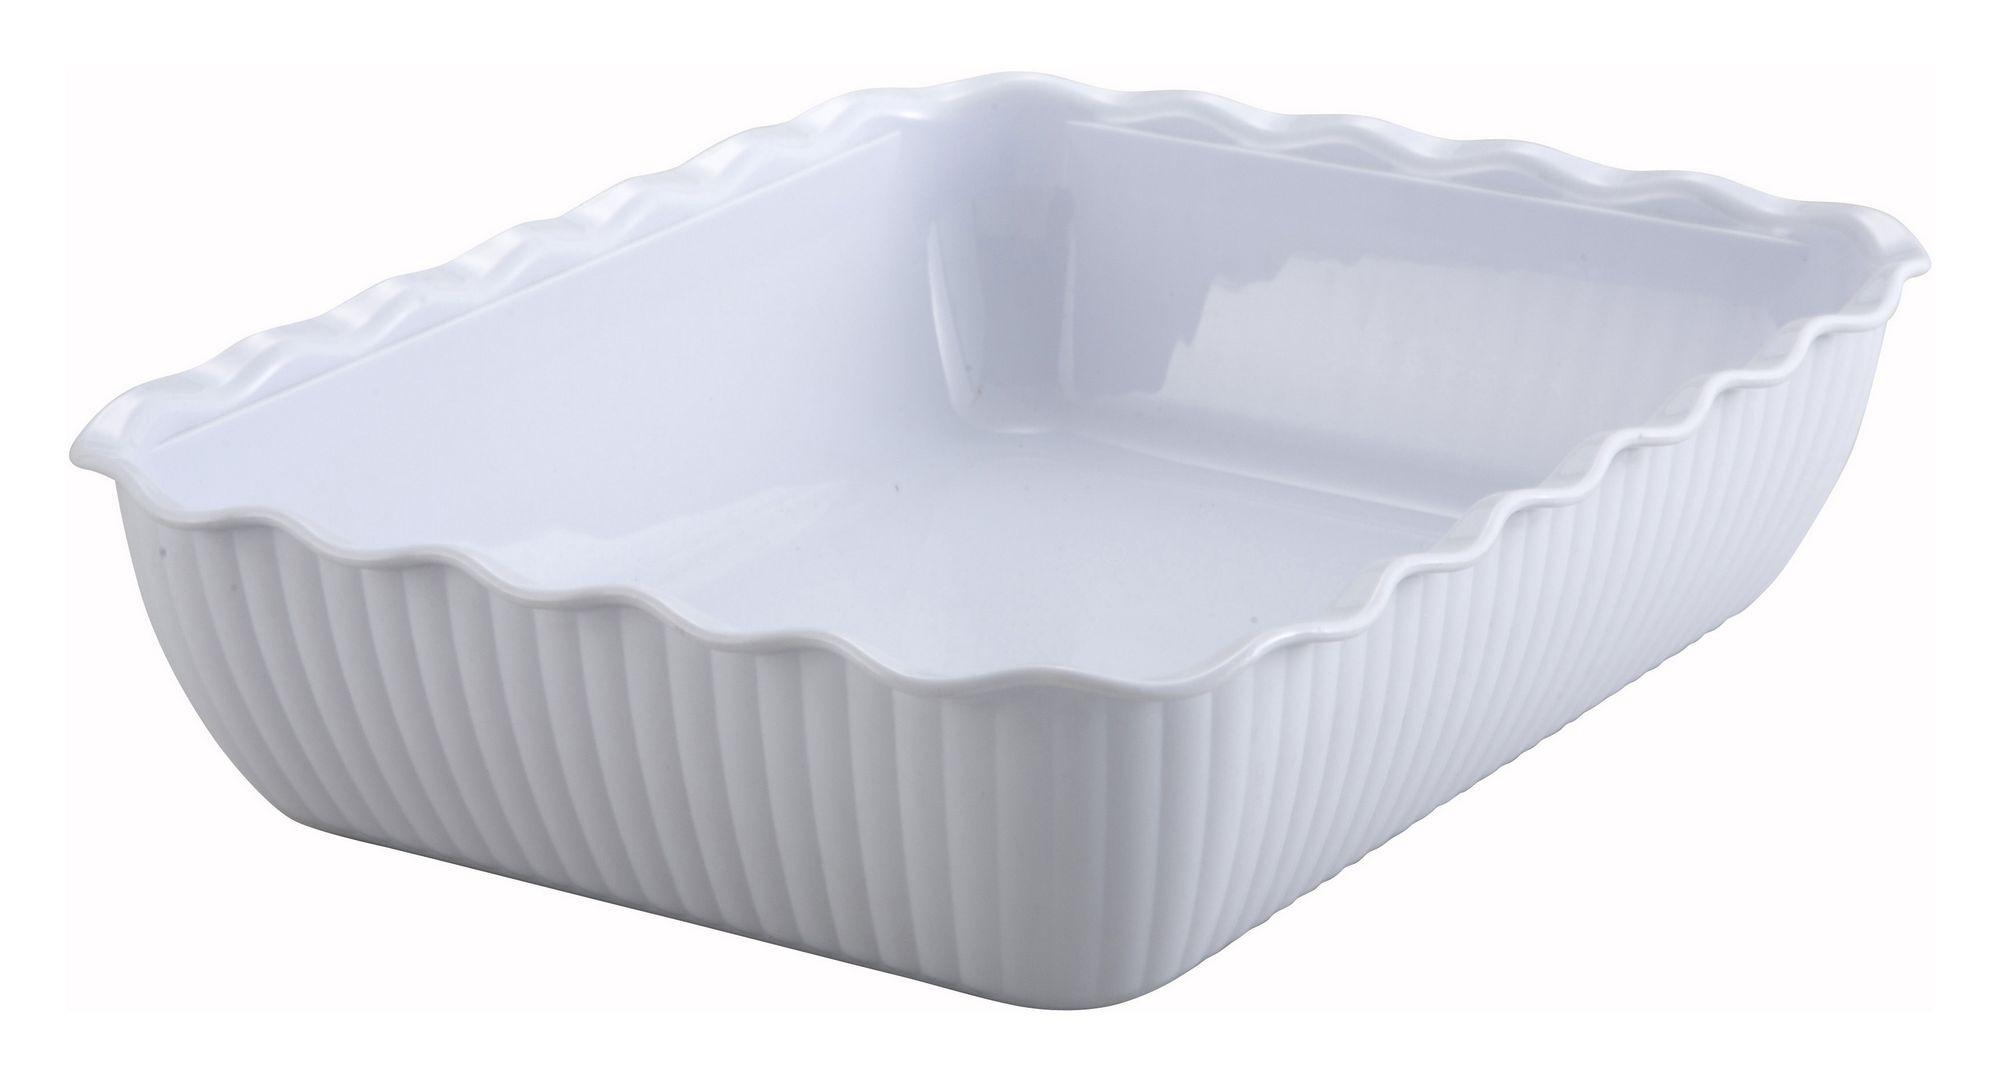 "Winco CRK-13W White Food Storage Container/Crock 13 x 10"" x 3"""